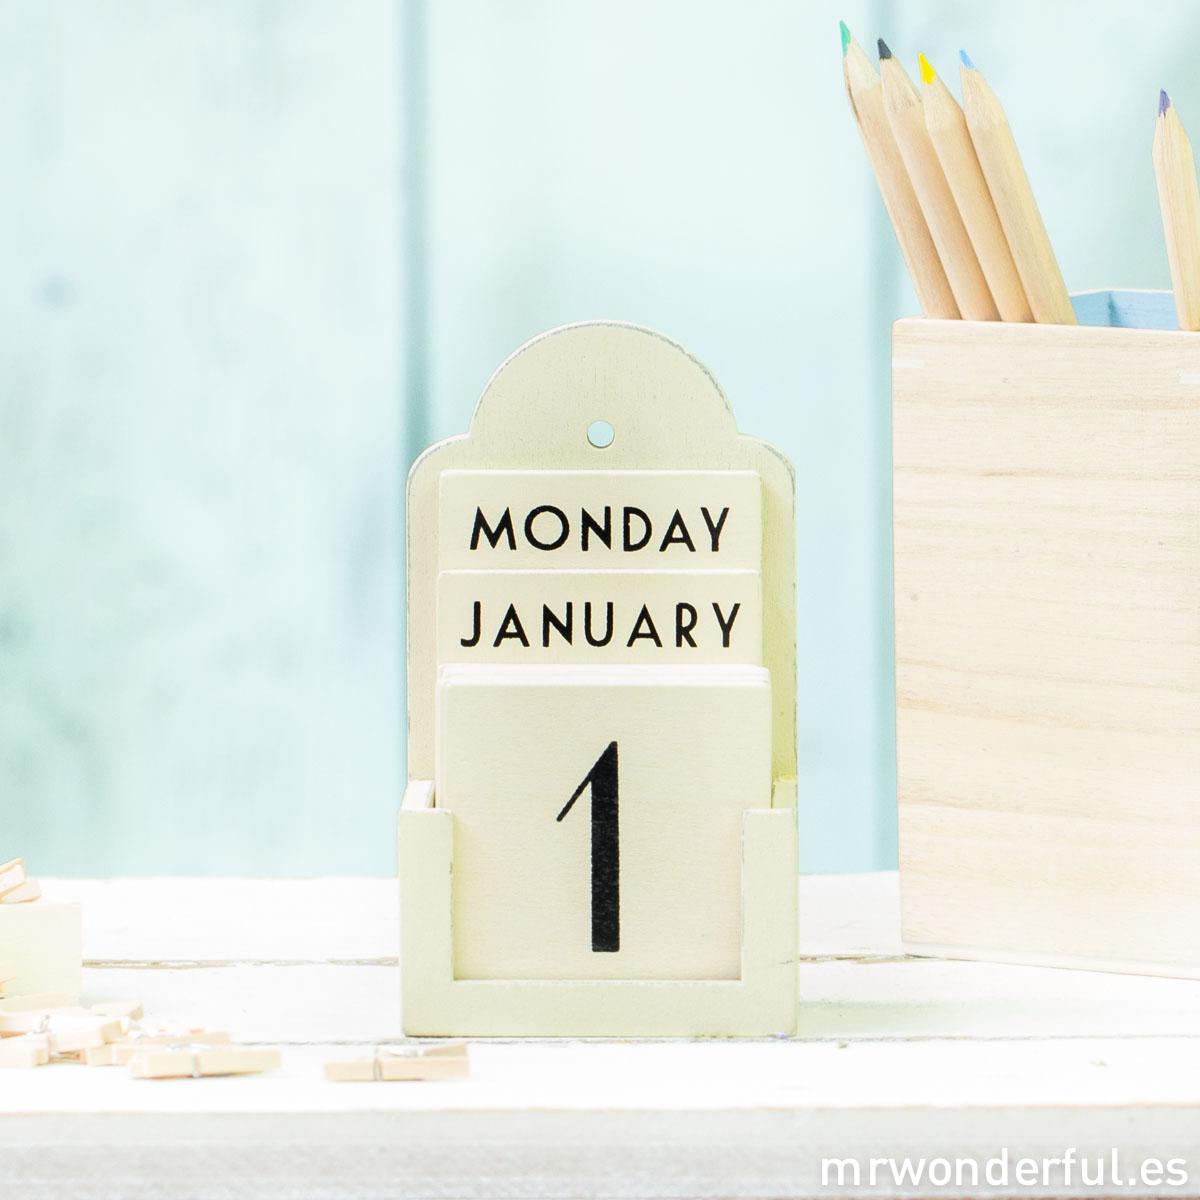 mrwonderful_1205_calendario-perpetuo-madera_beige-retro-1